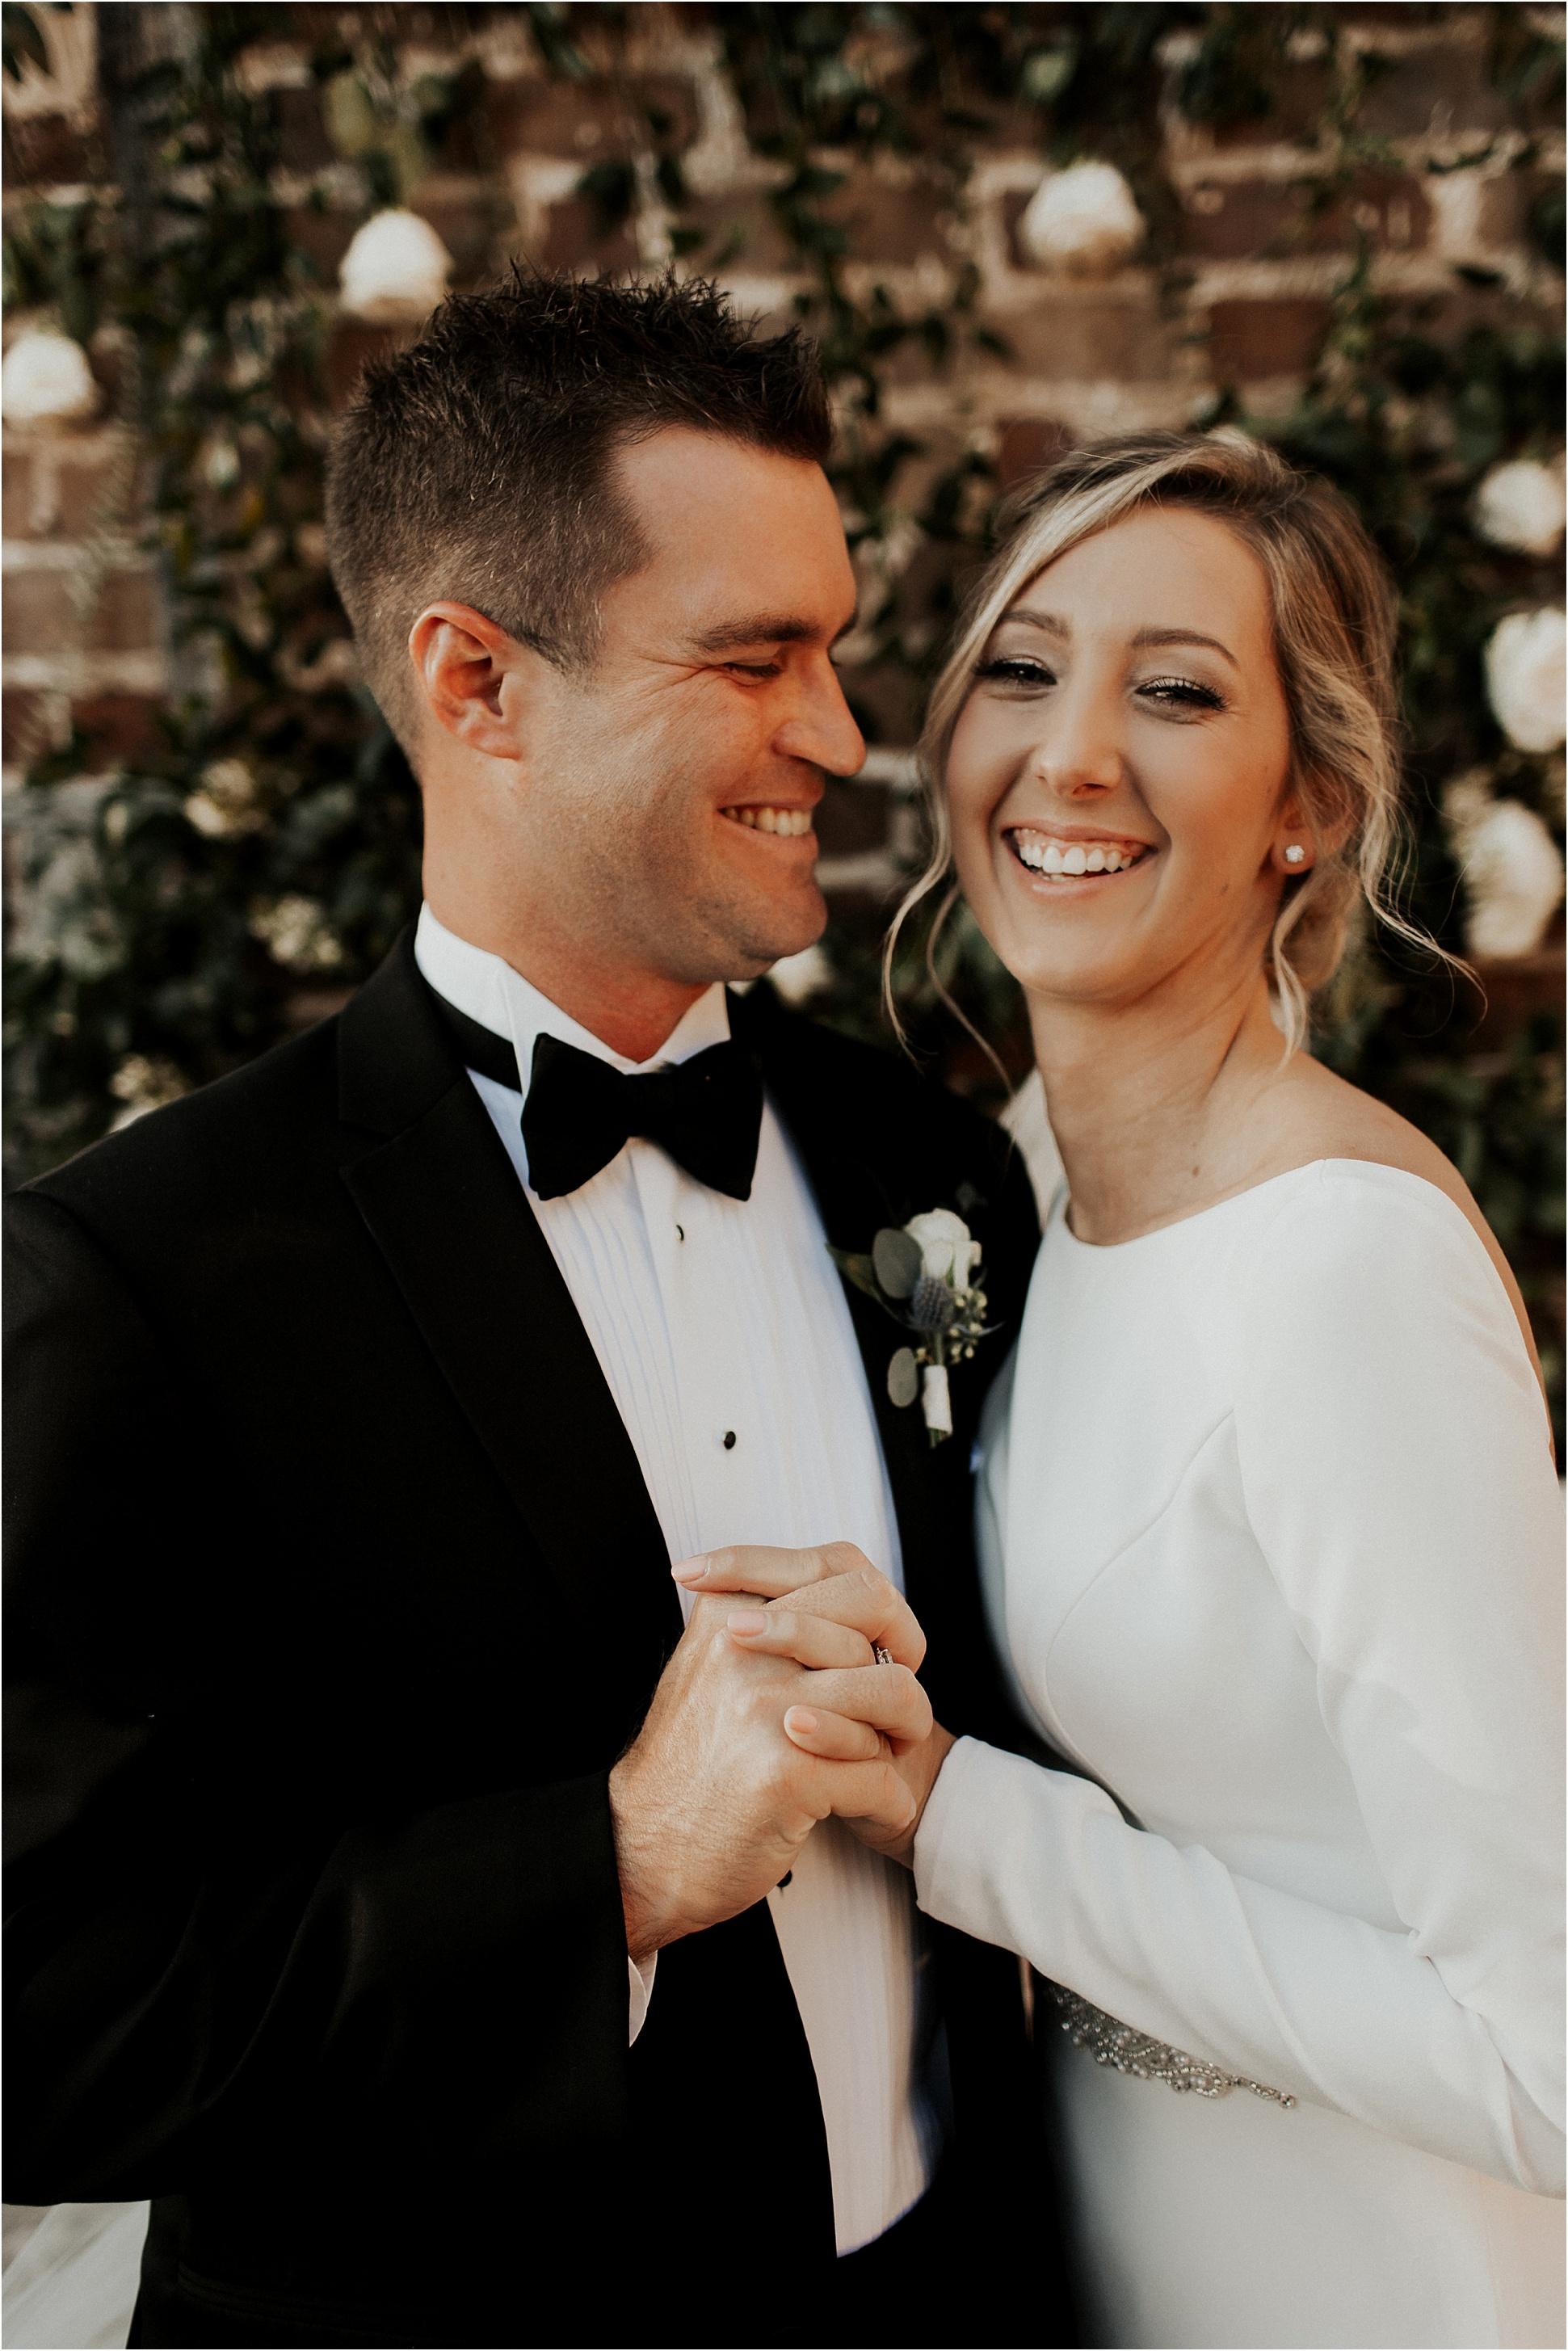 upstairs_midtown_intimate_charleston_wedding062.JPG